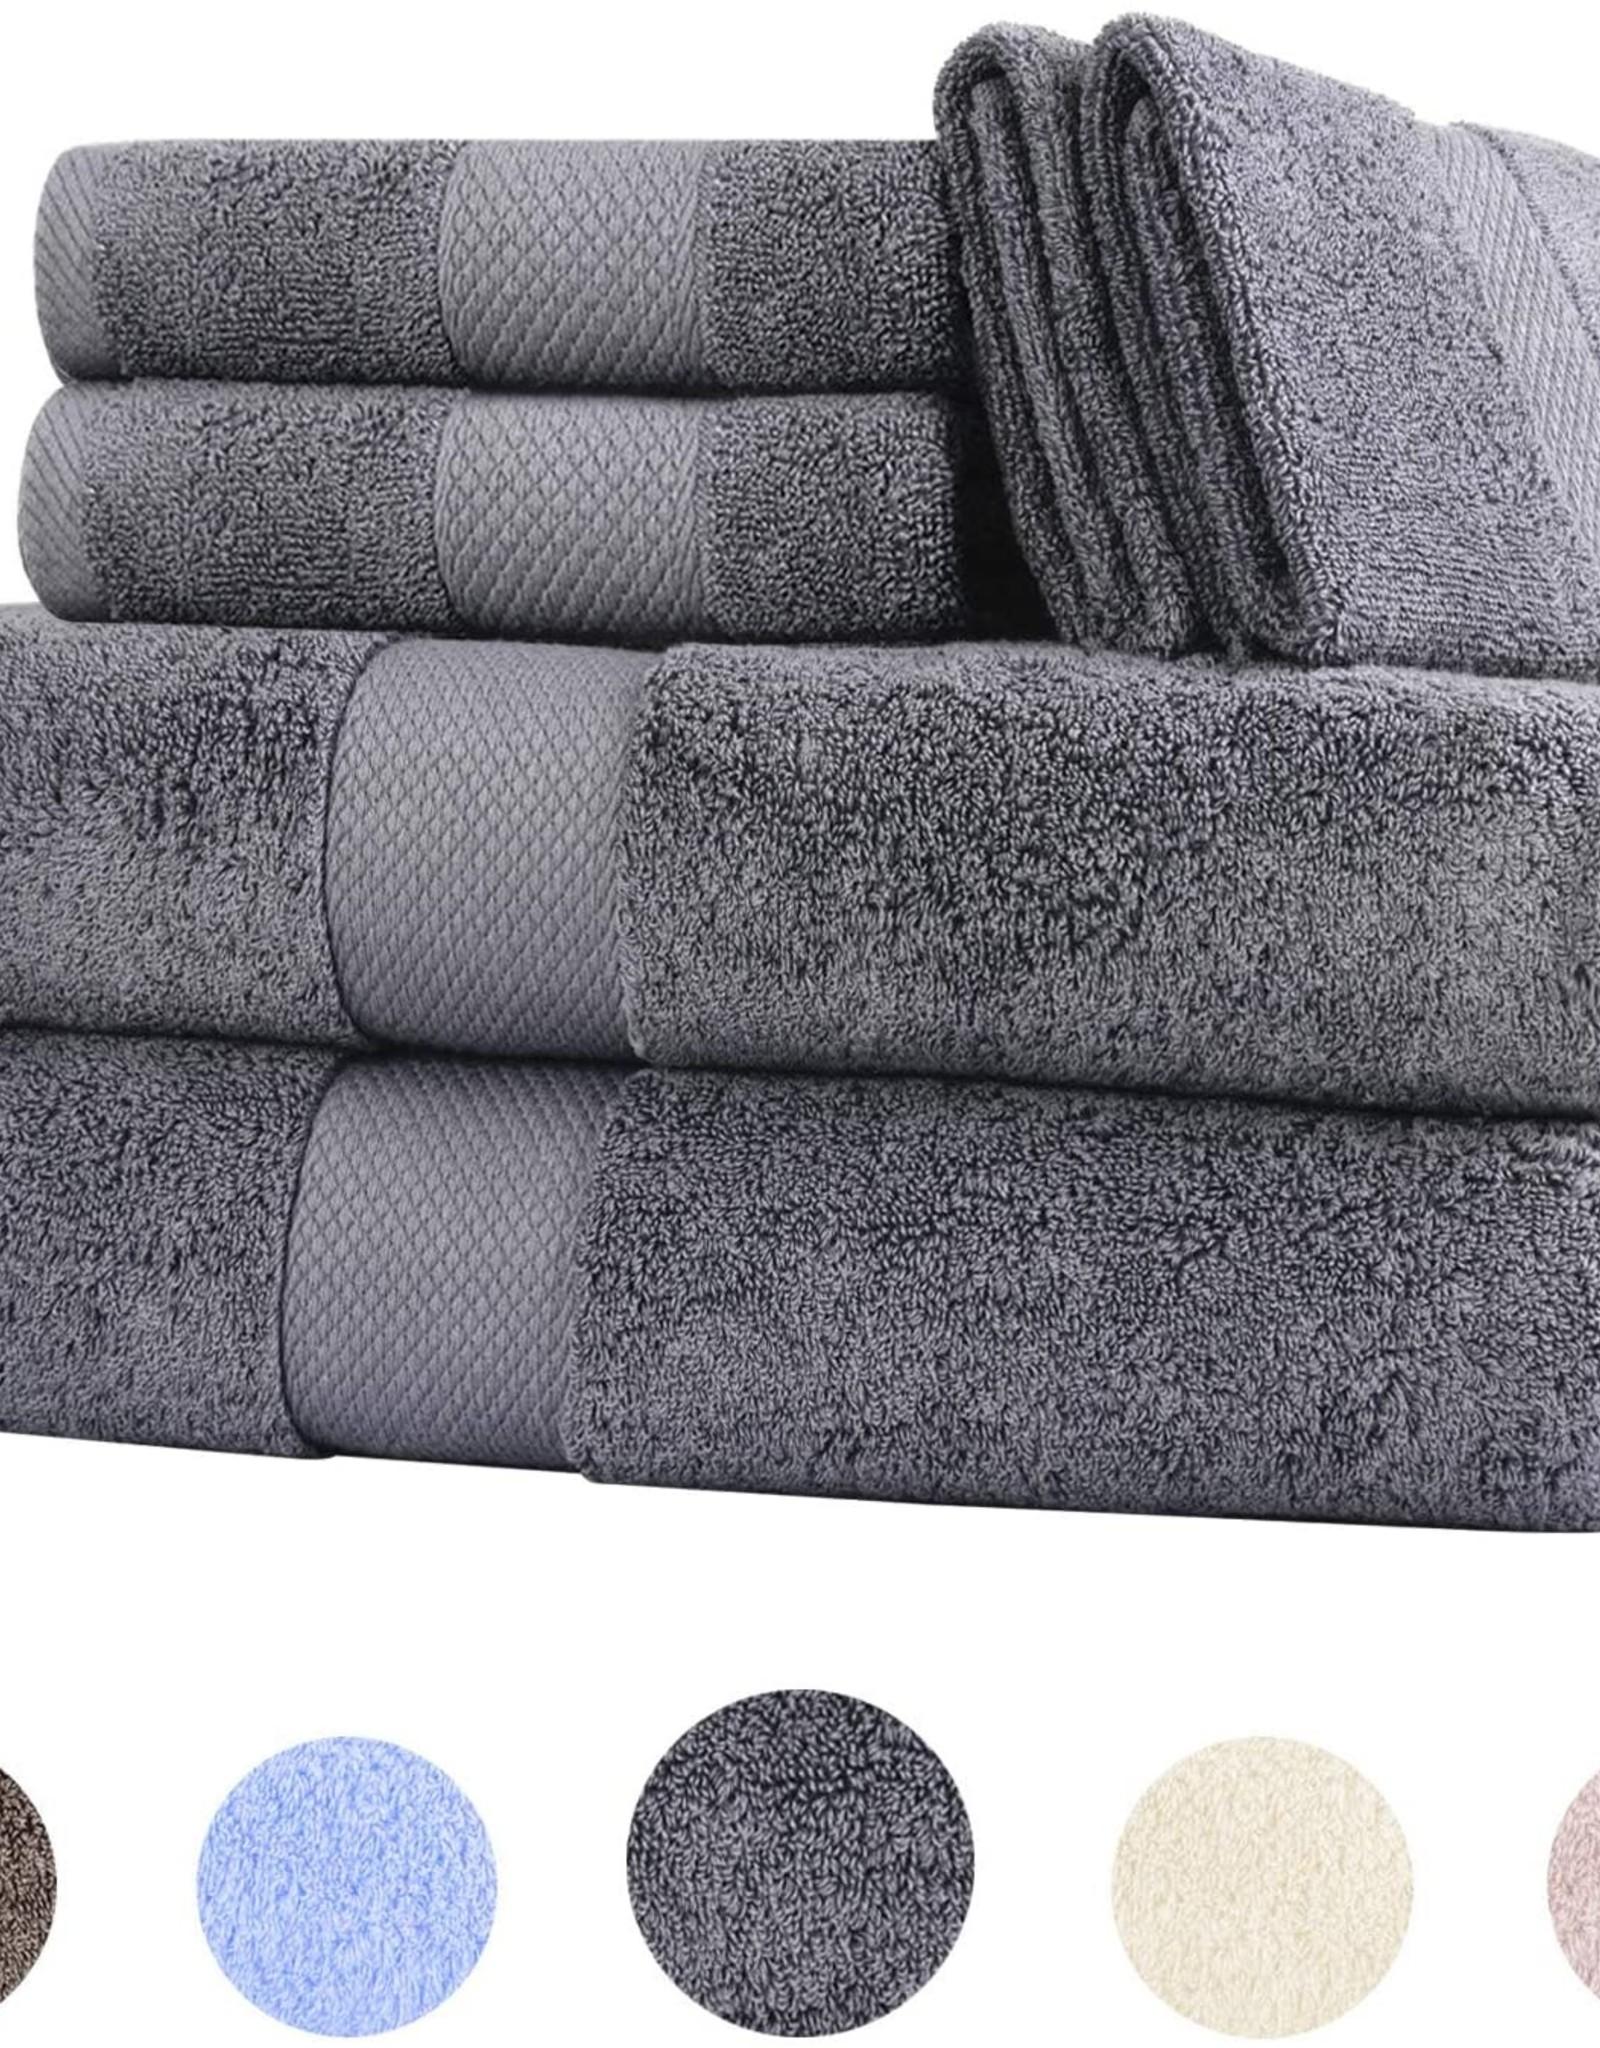 6-piece Towel Set White Monogrammed